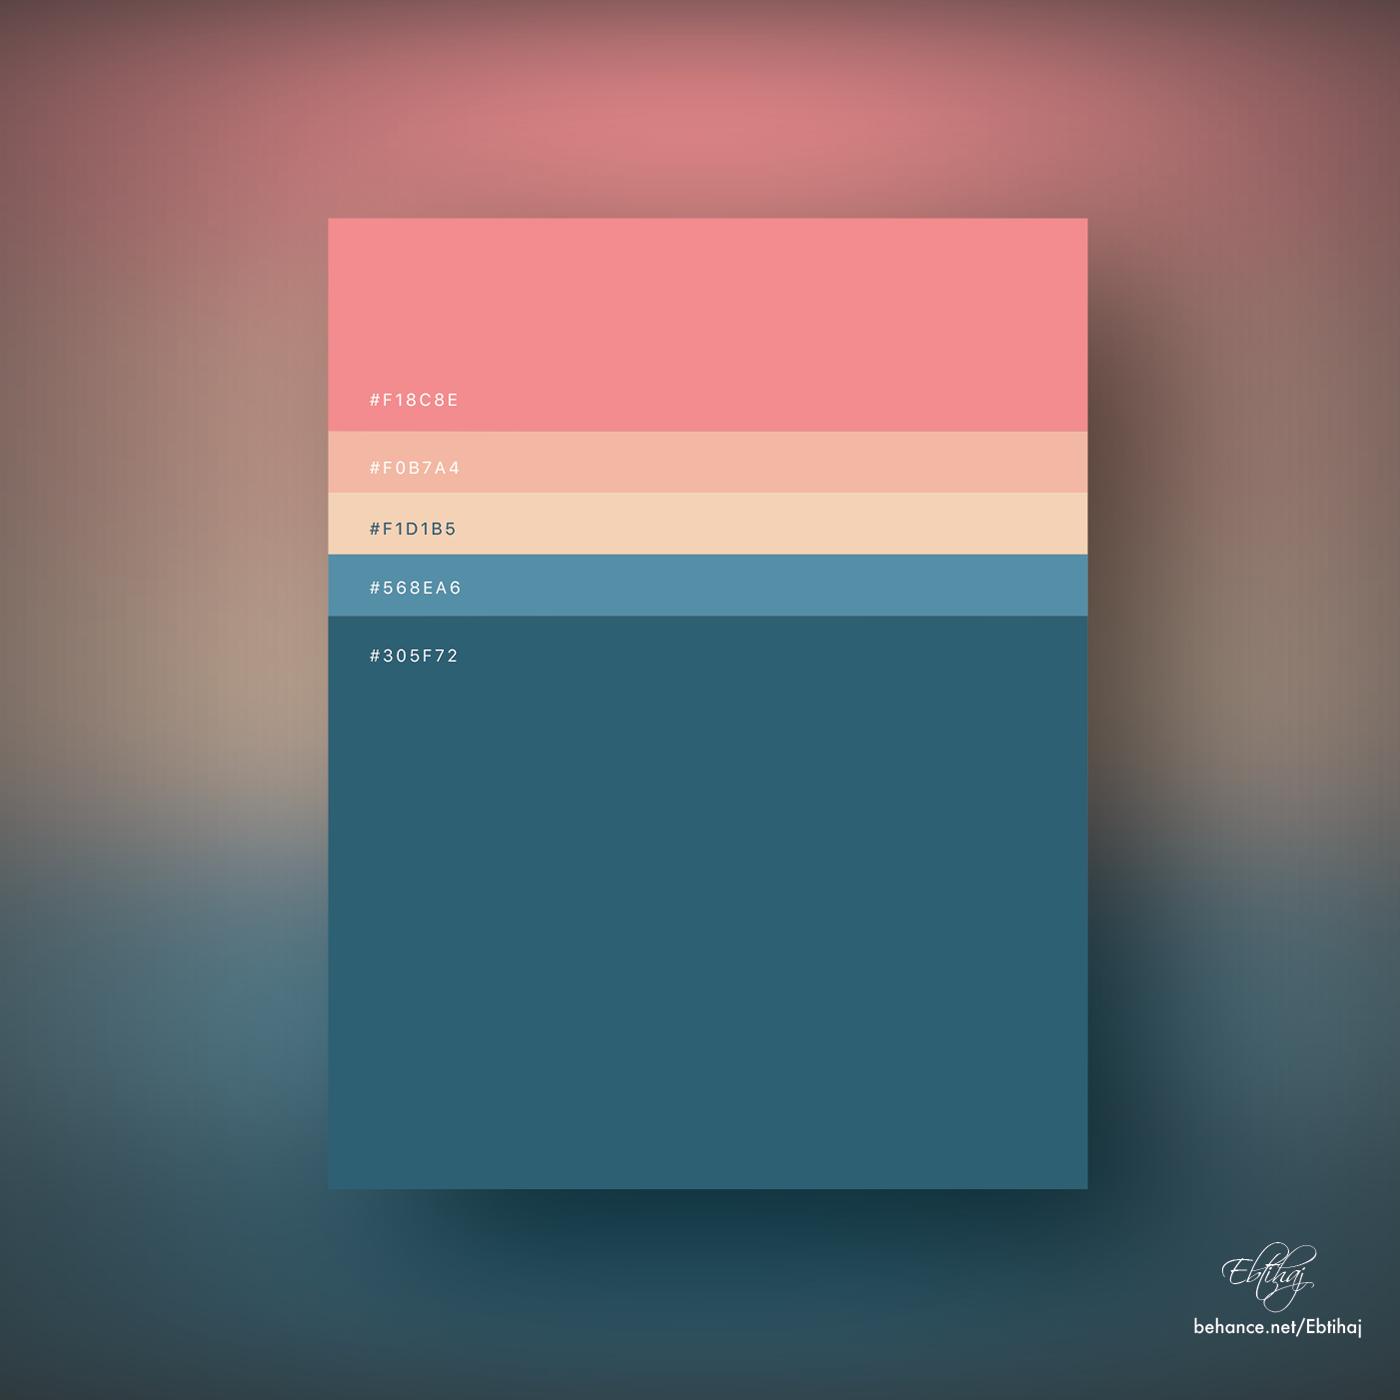 Colorful Minimalist Design: Minimalist Color Palettes 2018 On Behance